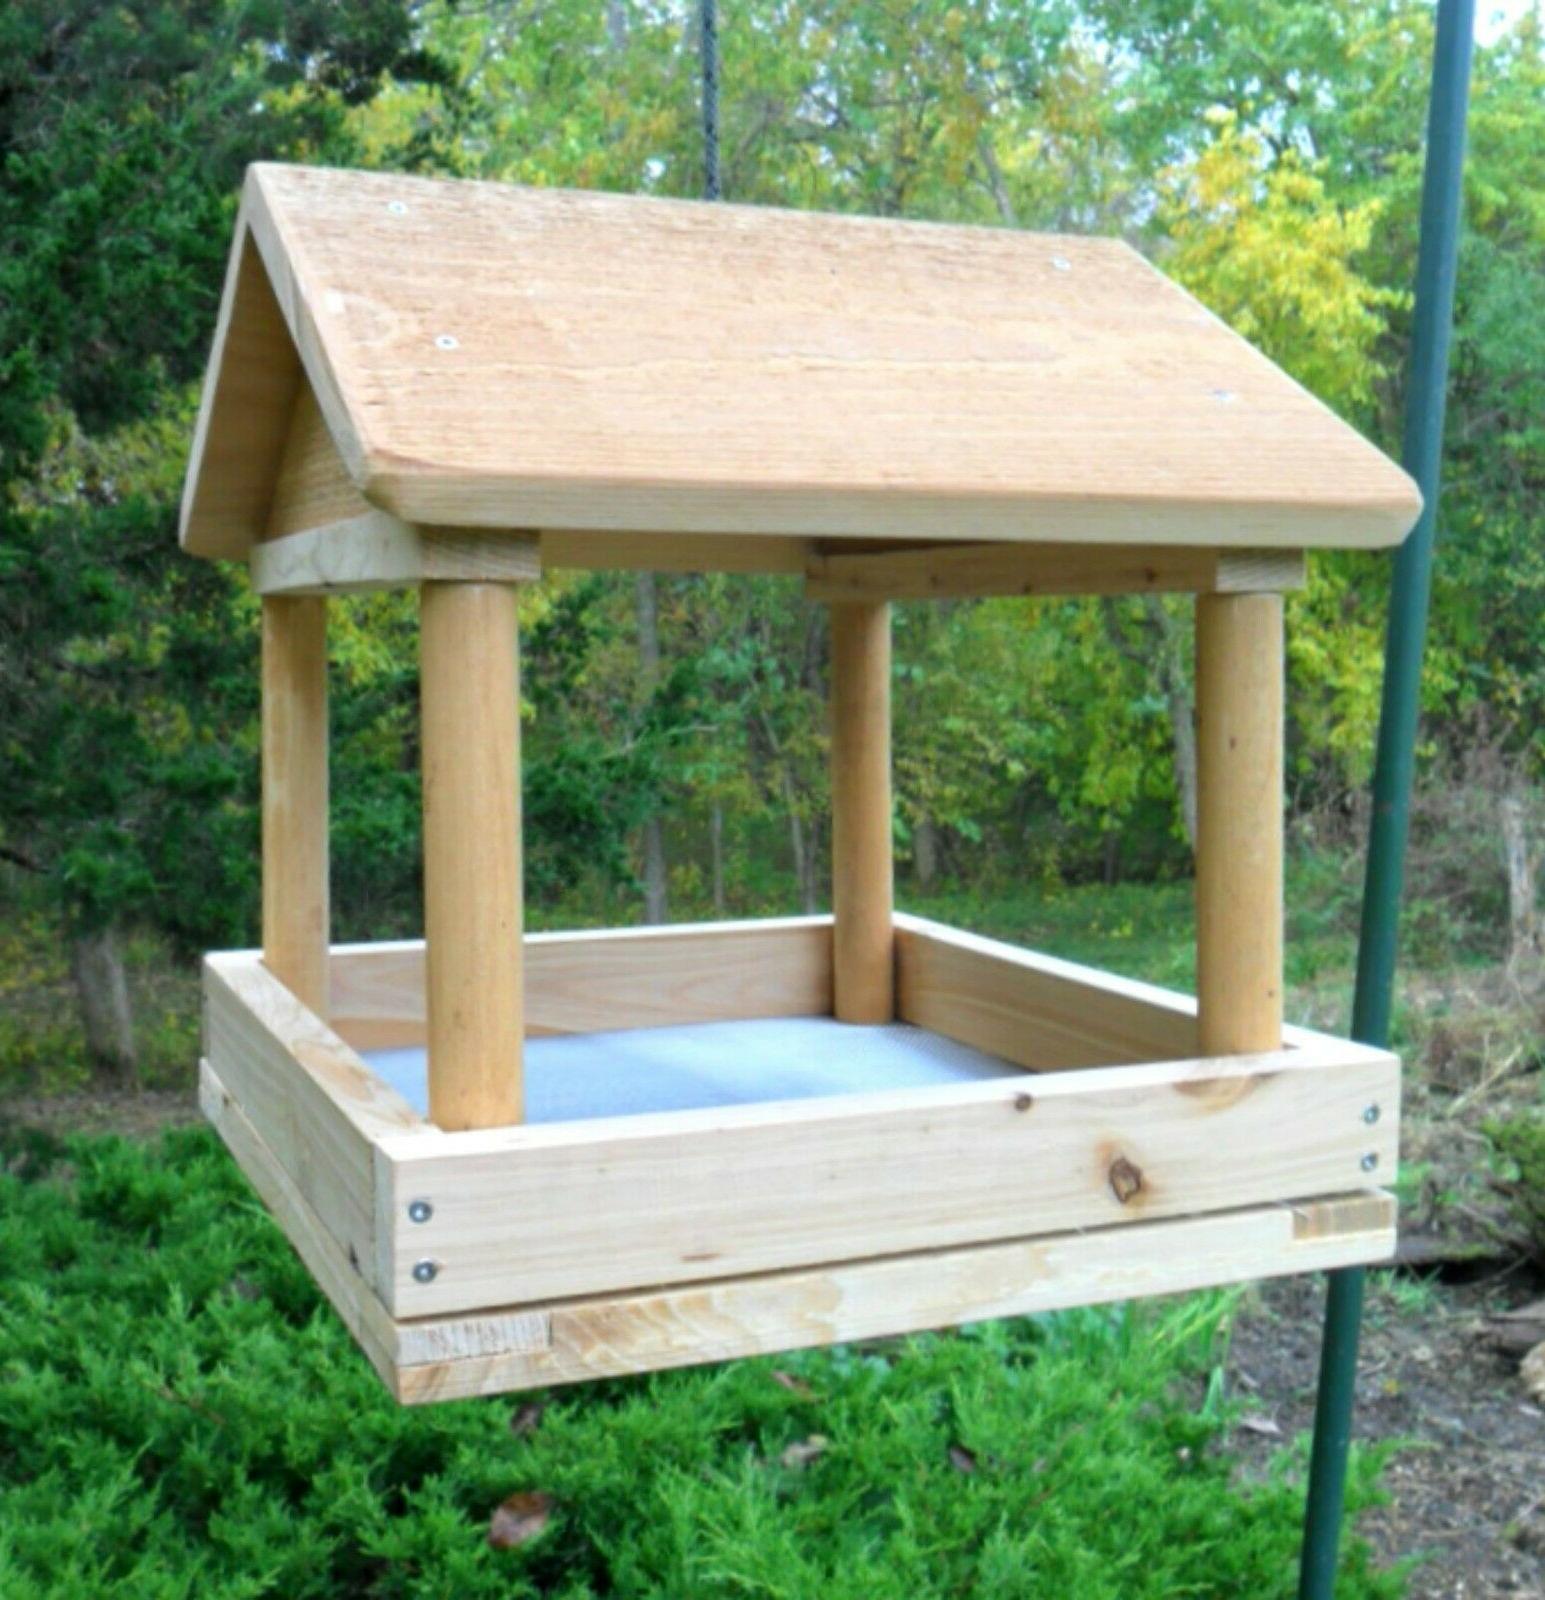 Handcrafted Tray Bird Large Wood Platform Feeders, Hanging